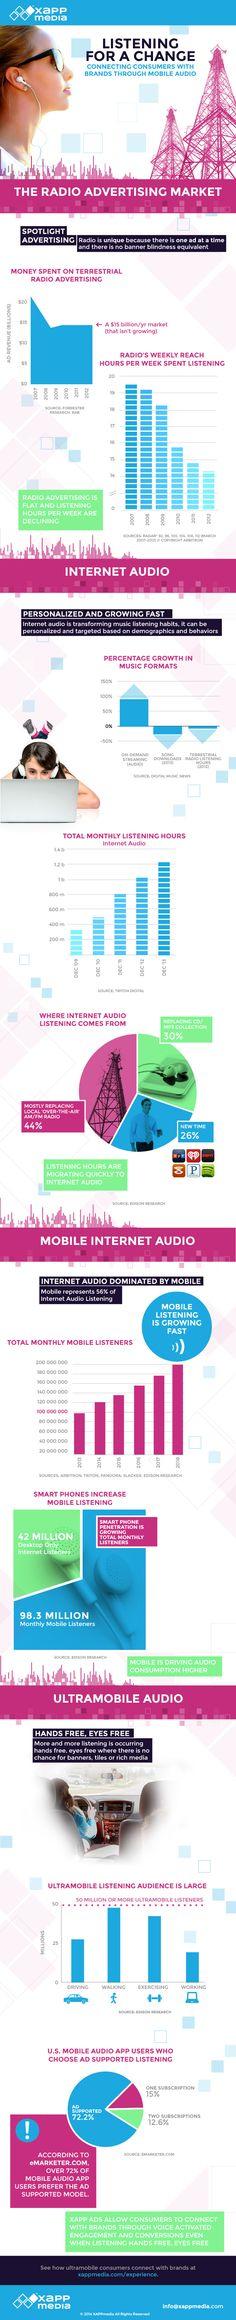 Internet Radio Market Infographic